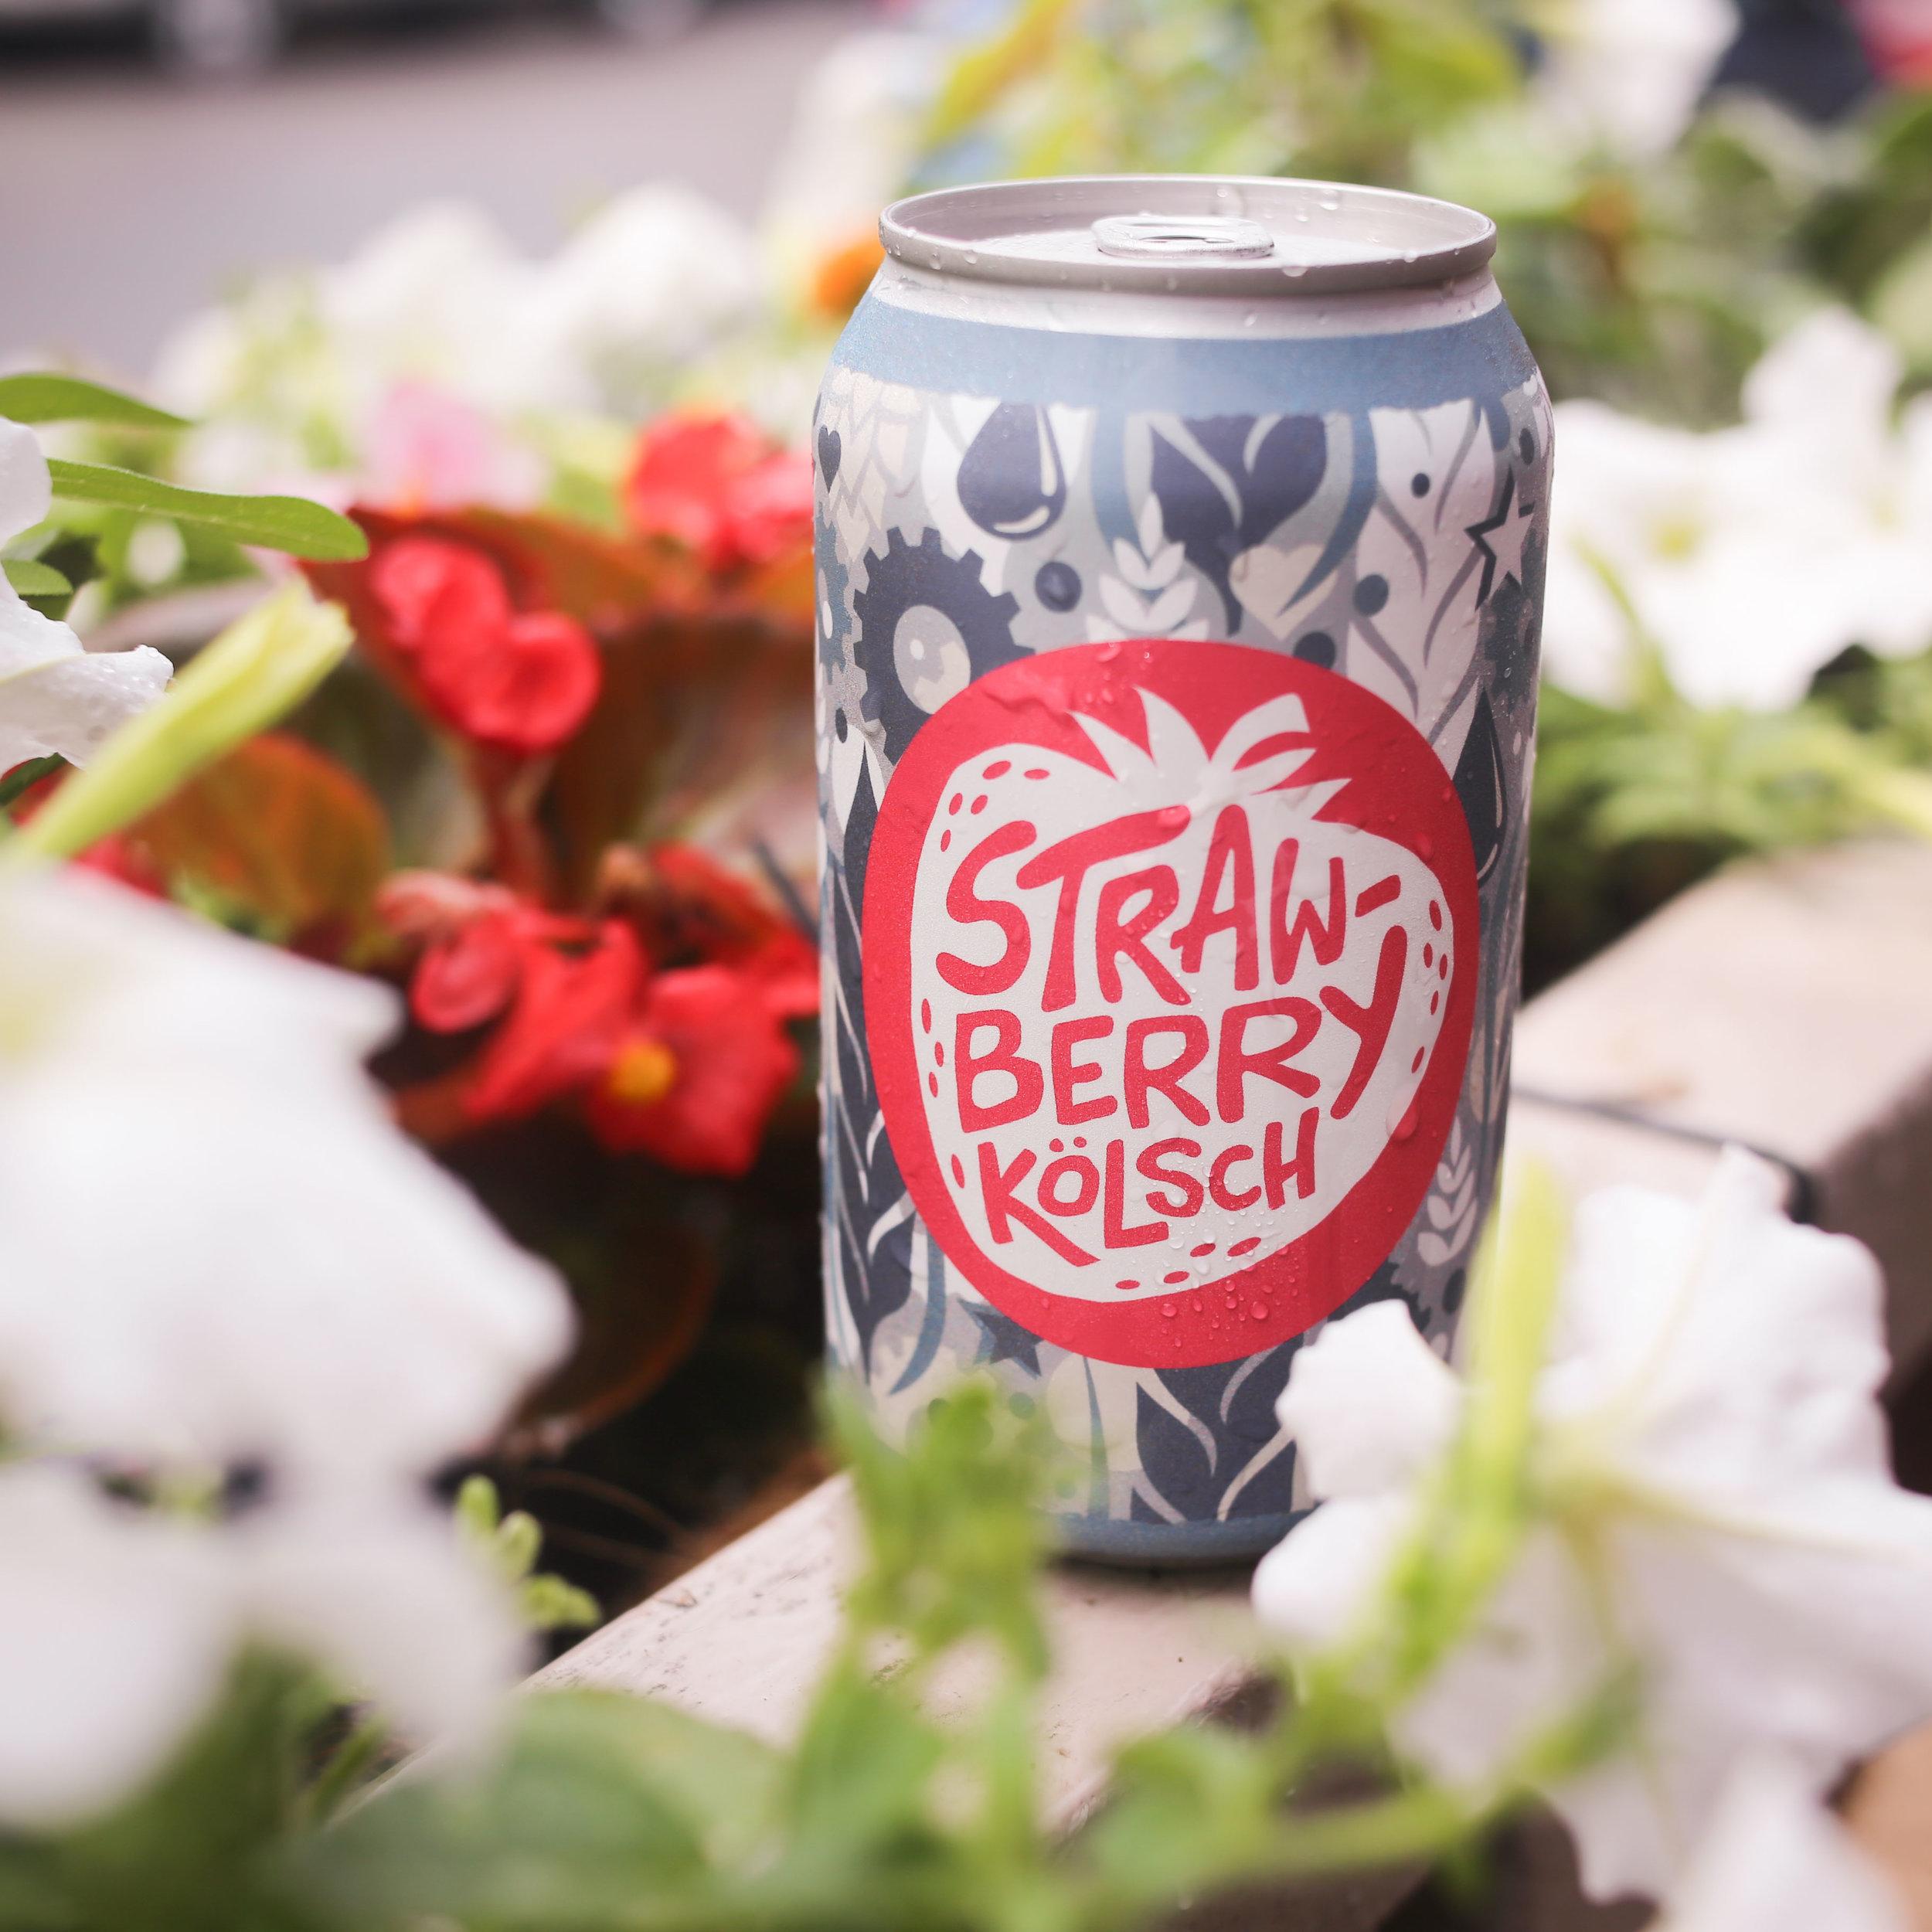 strawberrykolsch_sq.jpg